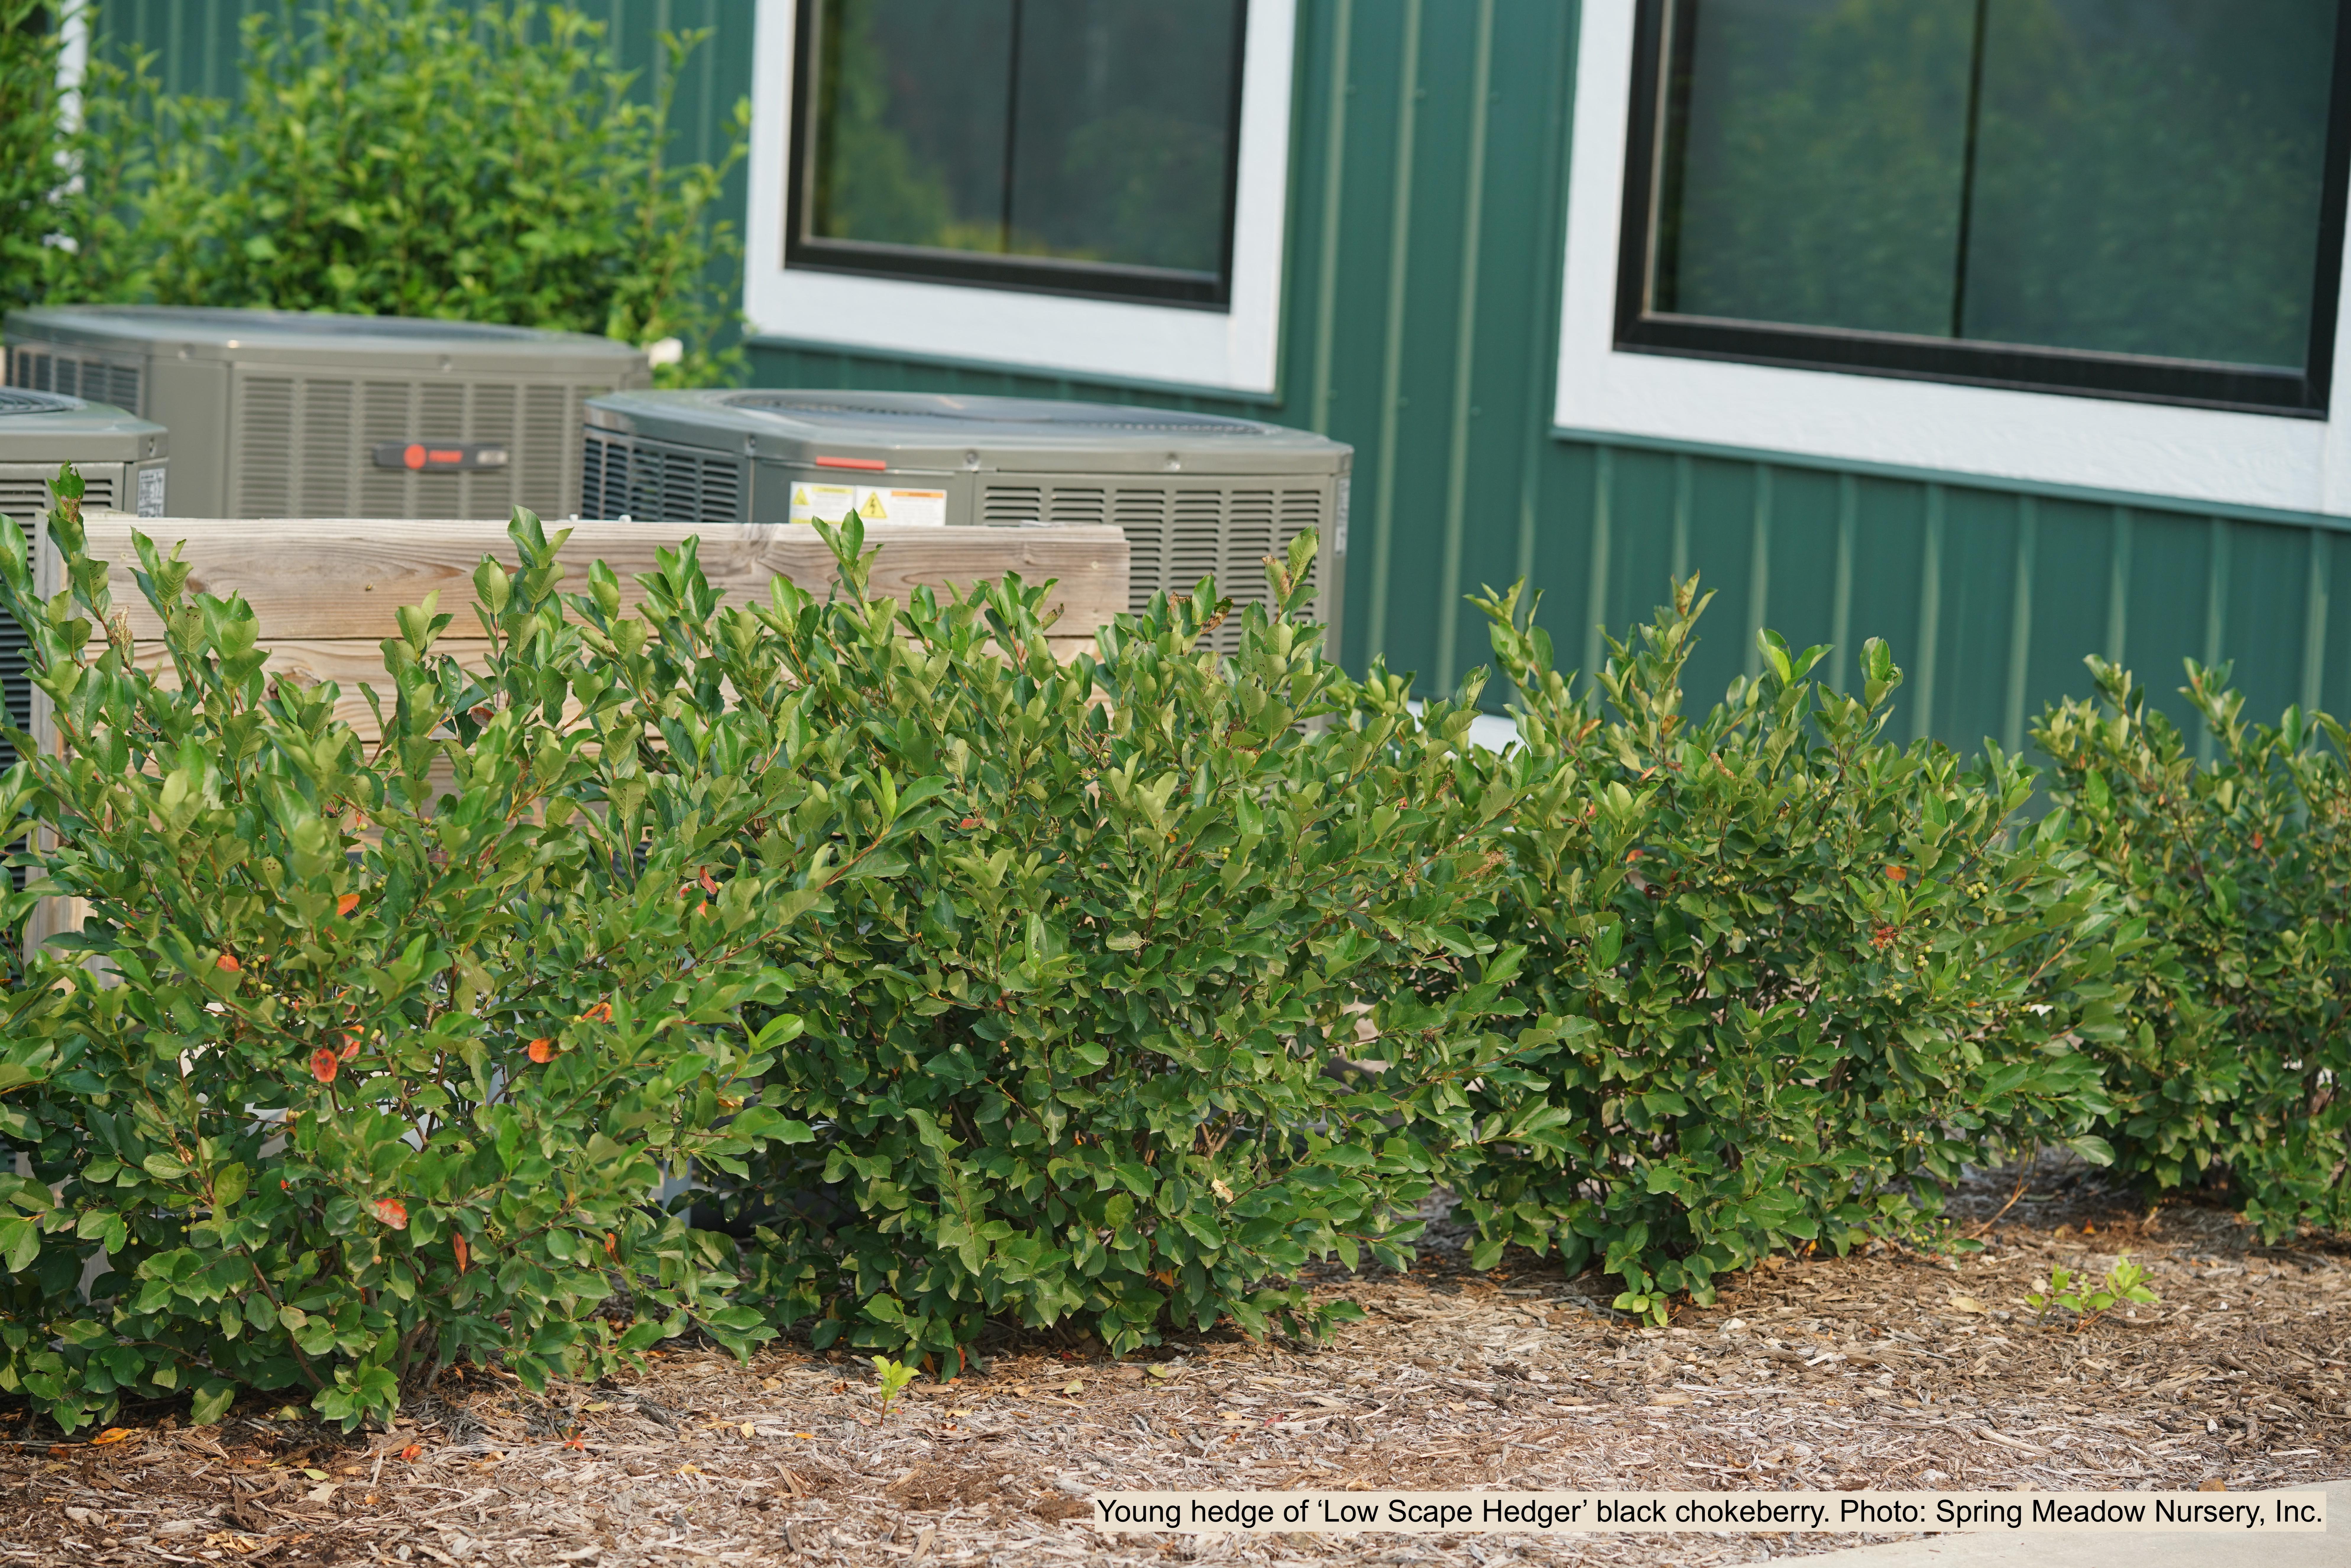 Hedge of black chokeberry.